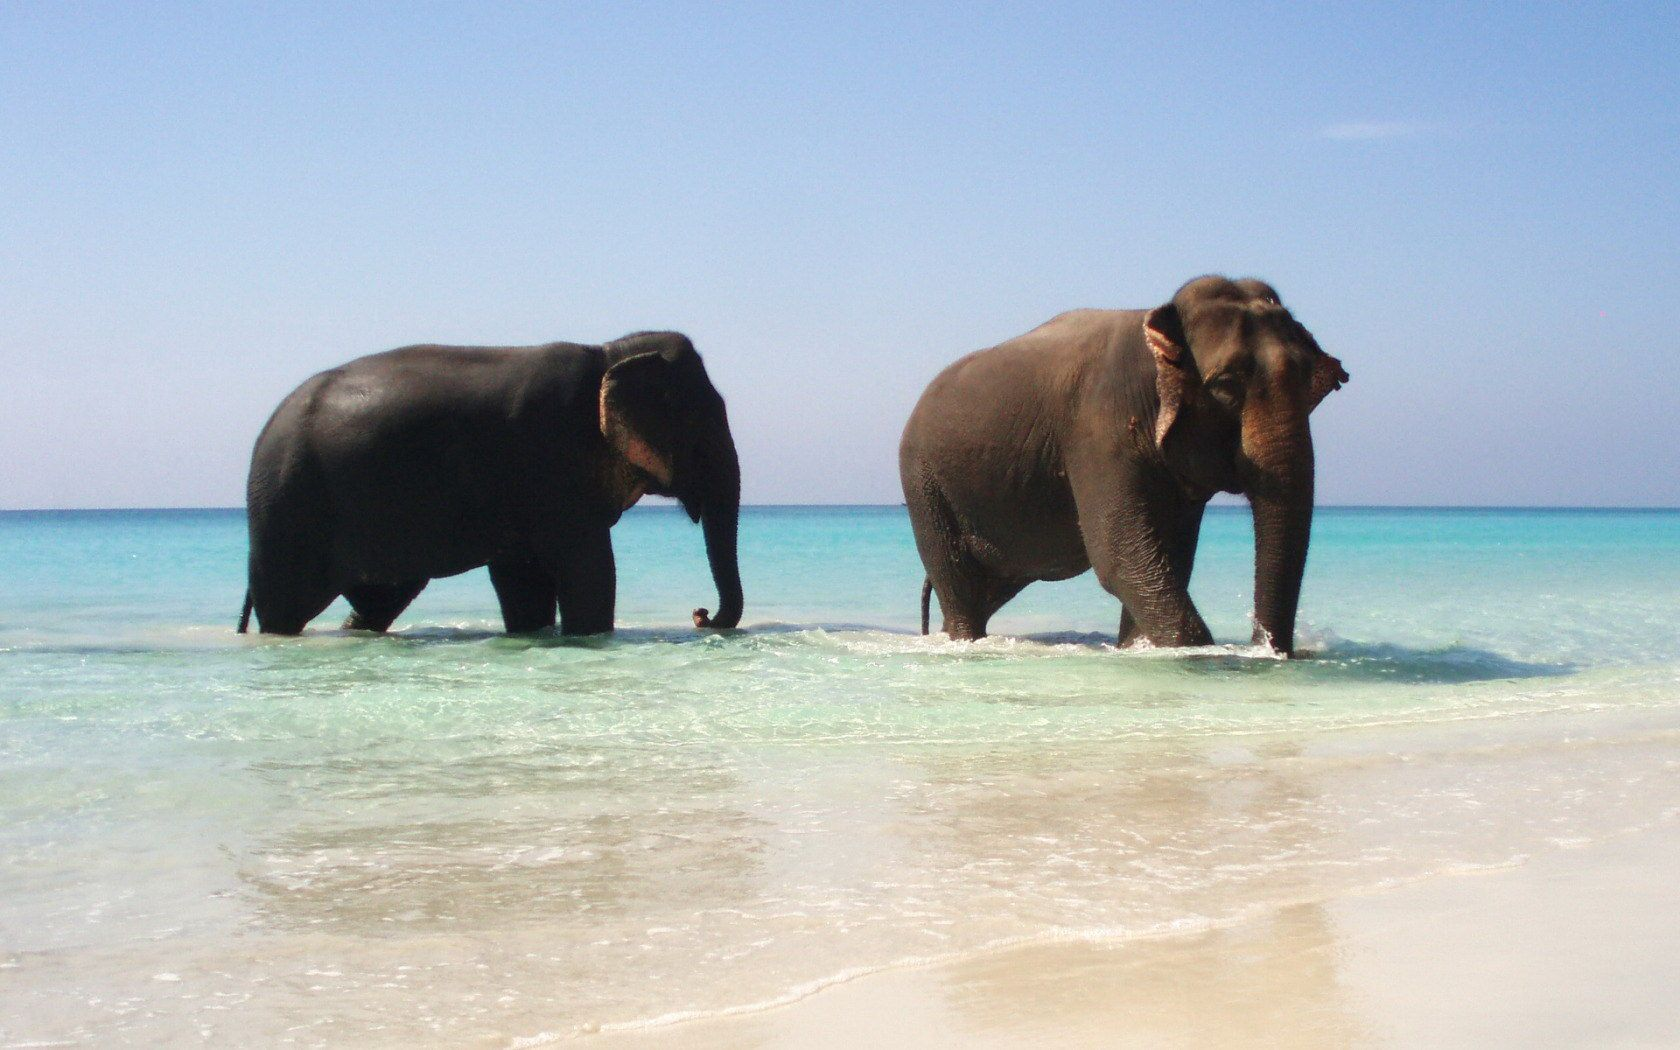 صورة لفيل Elefanten Tapete Elefanten Bilder Elefanten Hintergrund